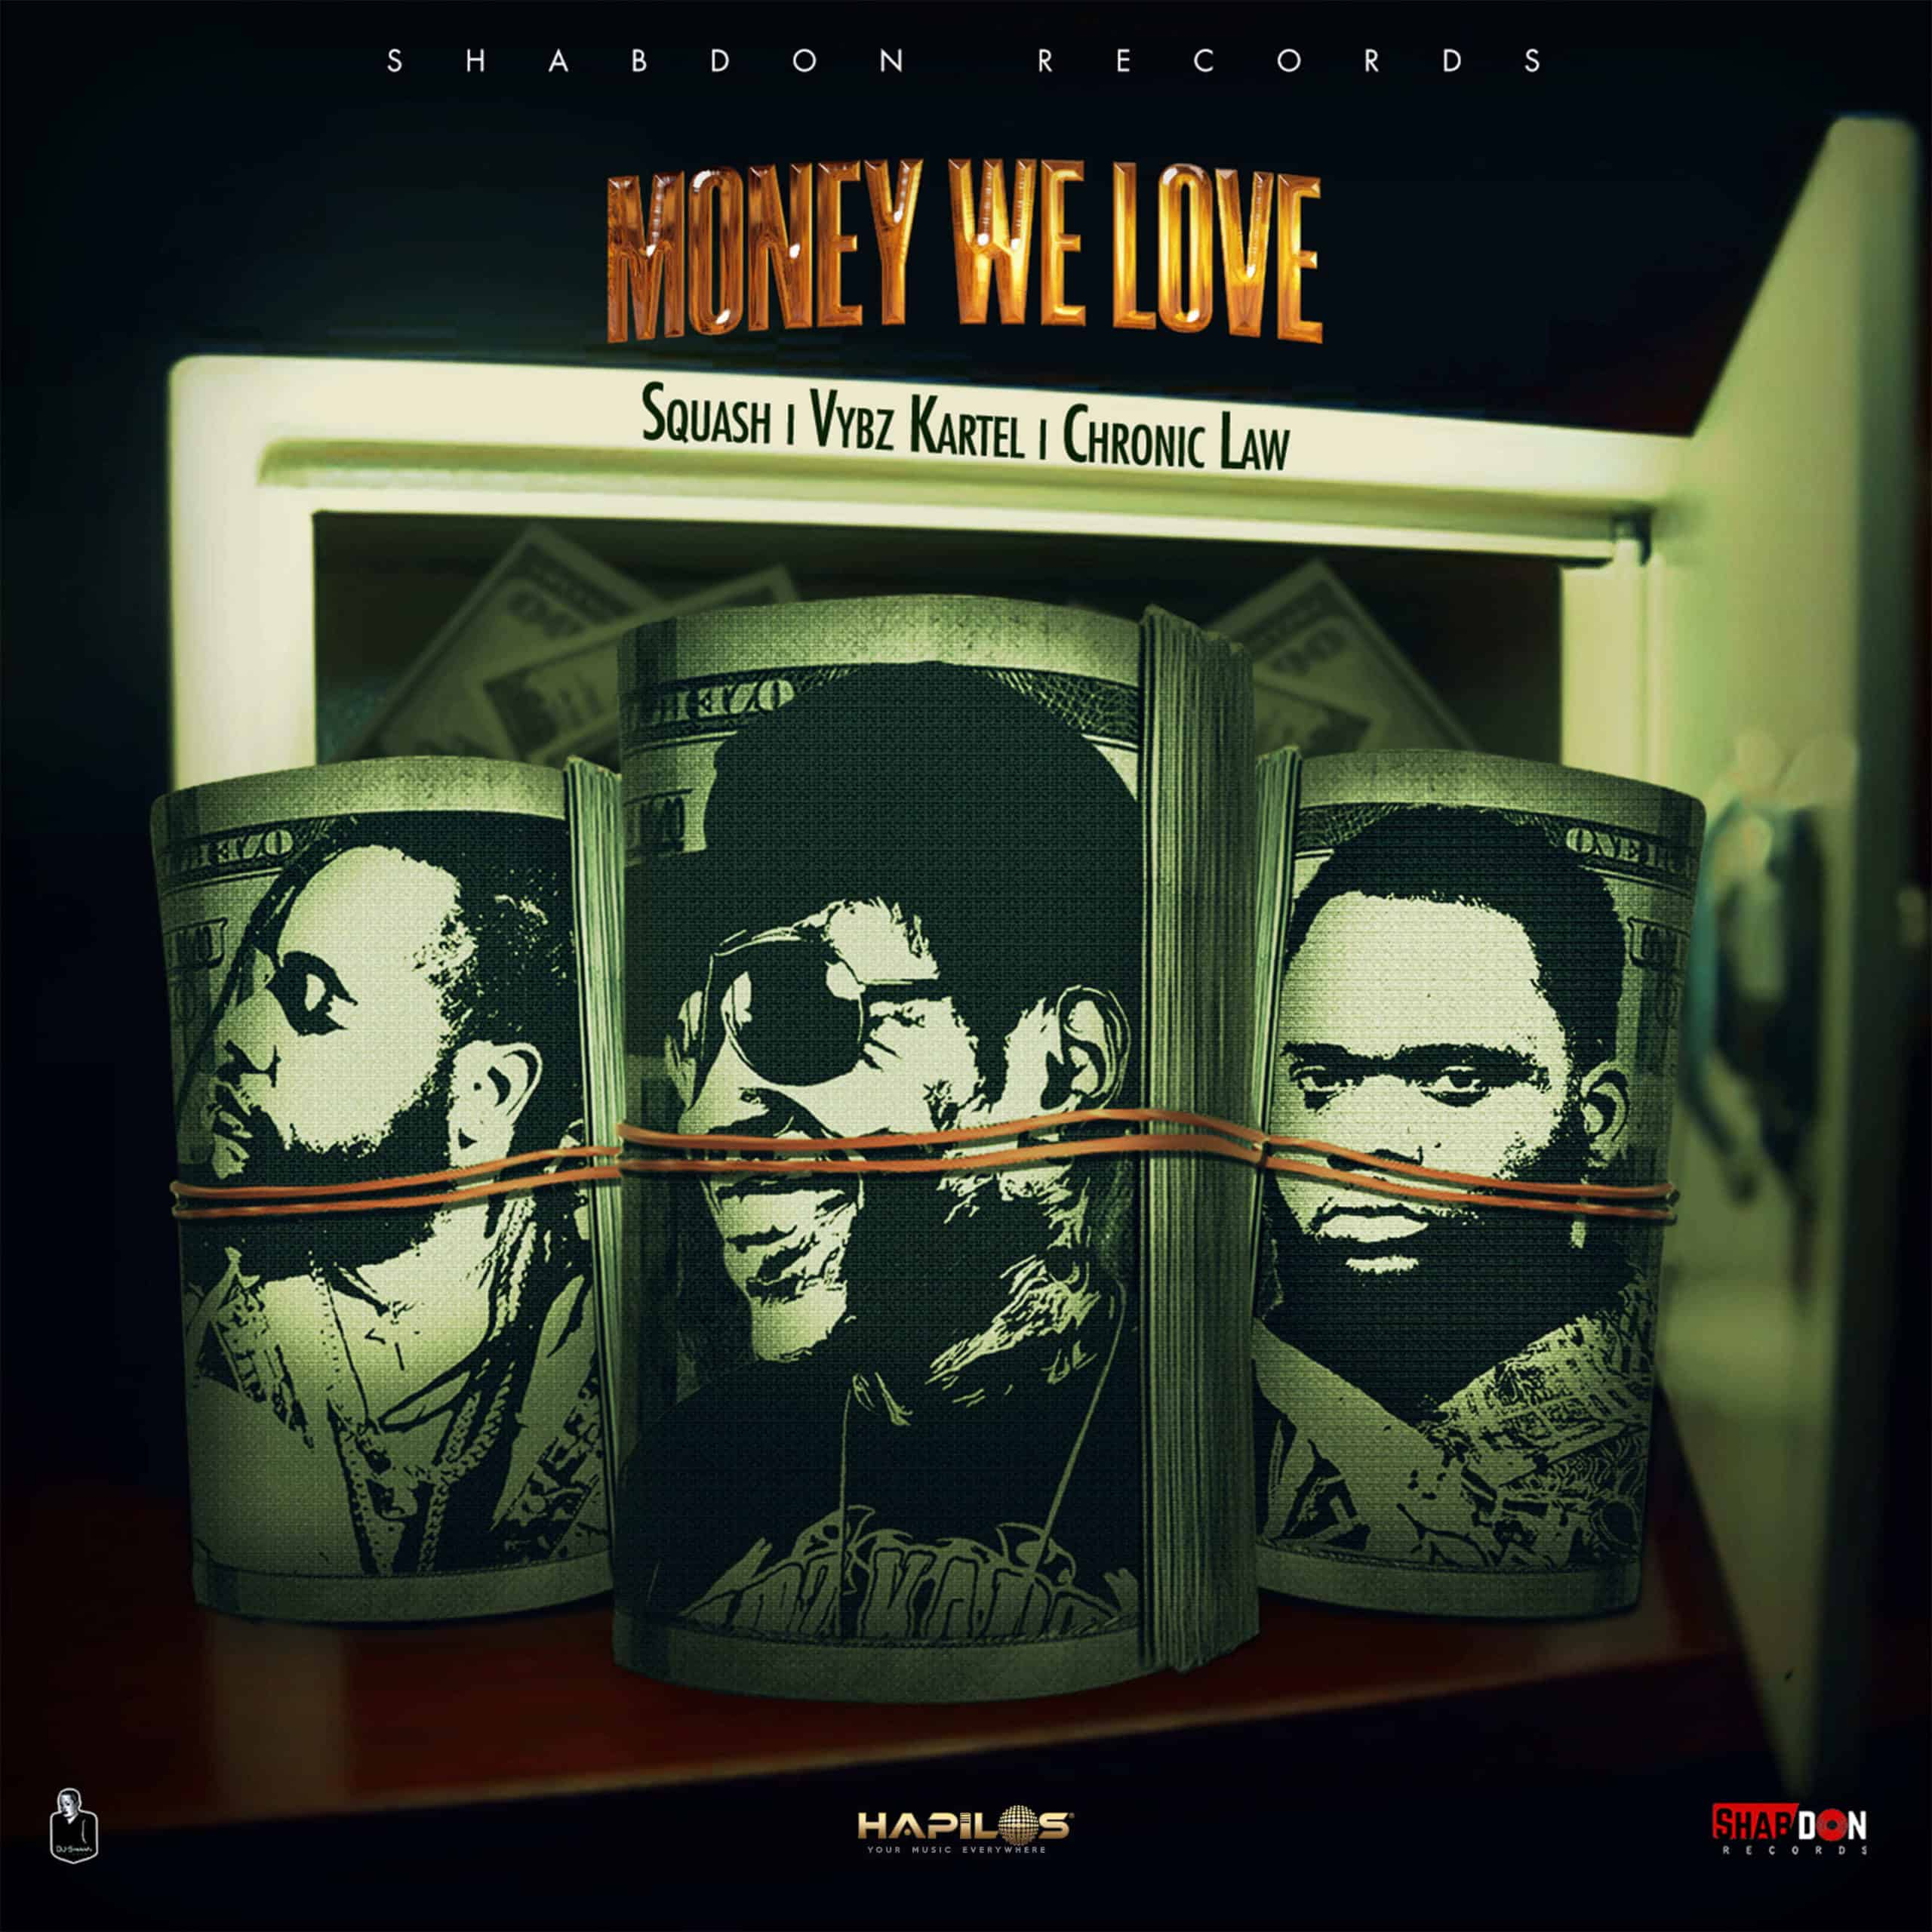 SQUASH, Vybz Kartel & Chronic Law - Money We Love - Shab Don Records